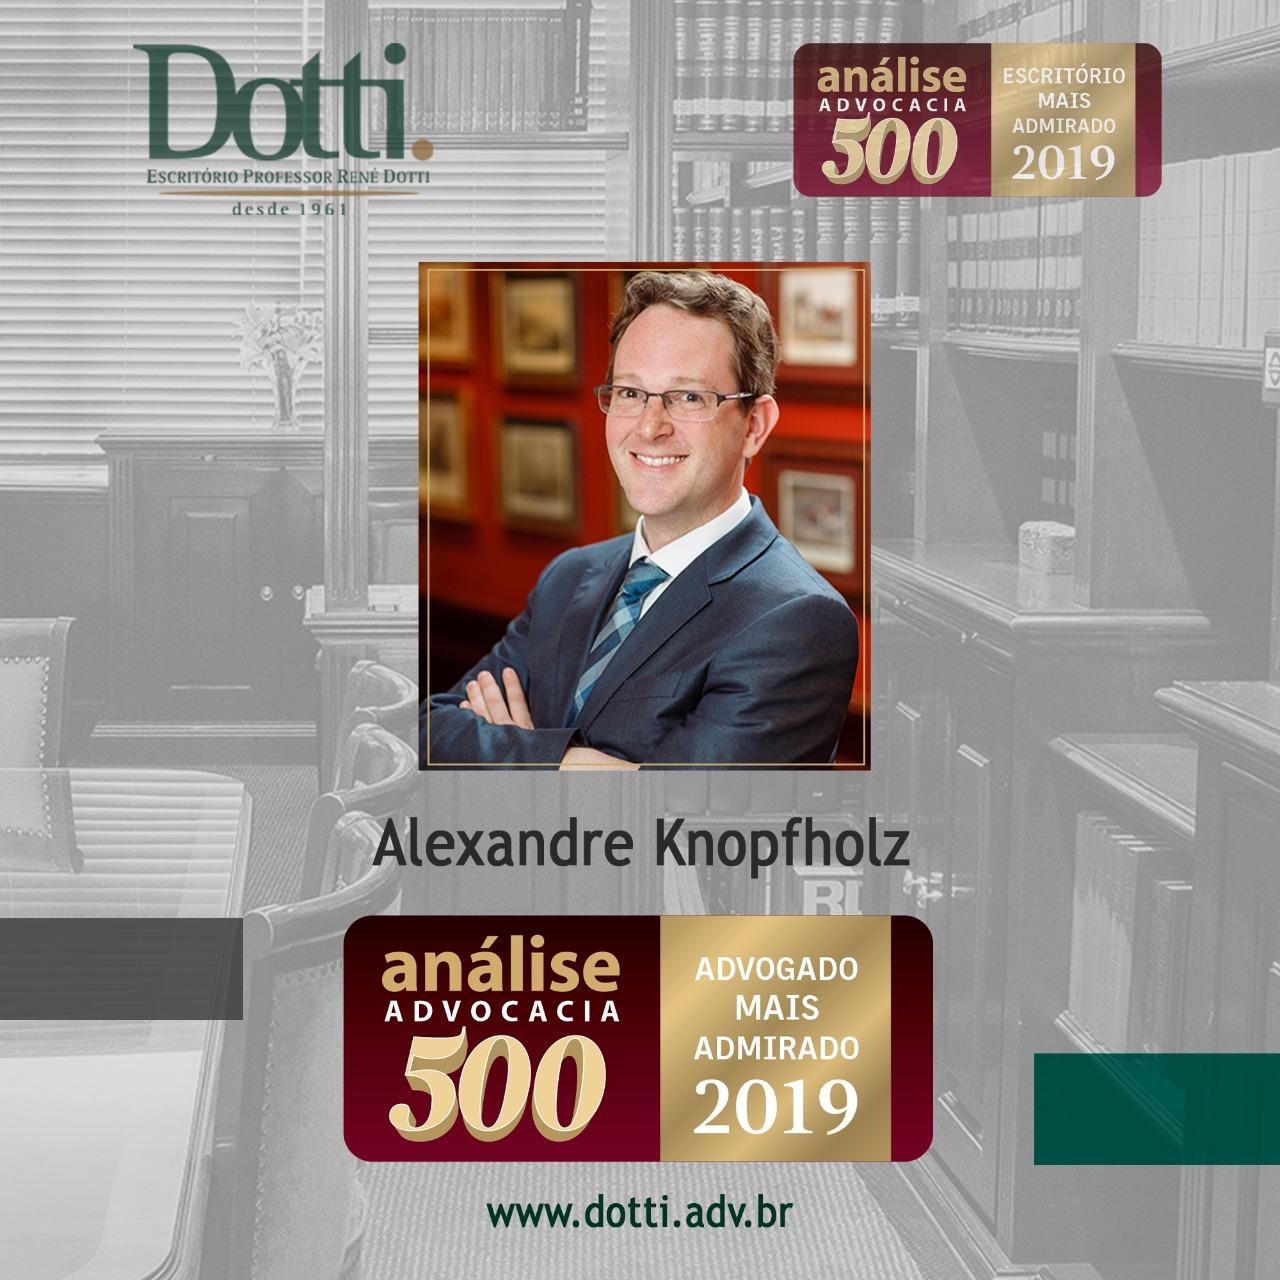 Alexandre Knopfholz